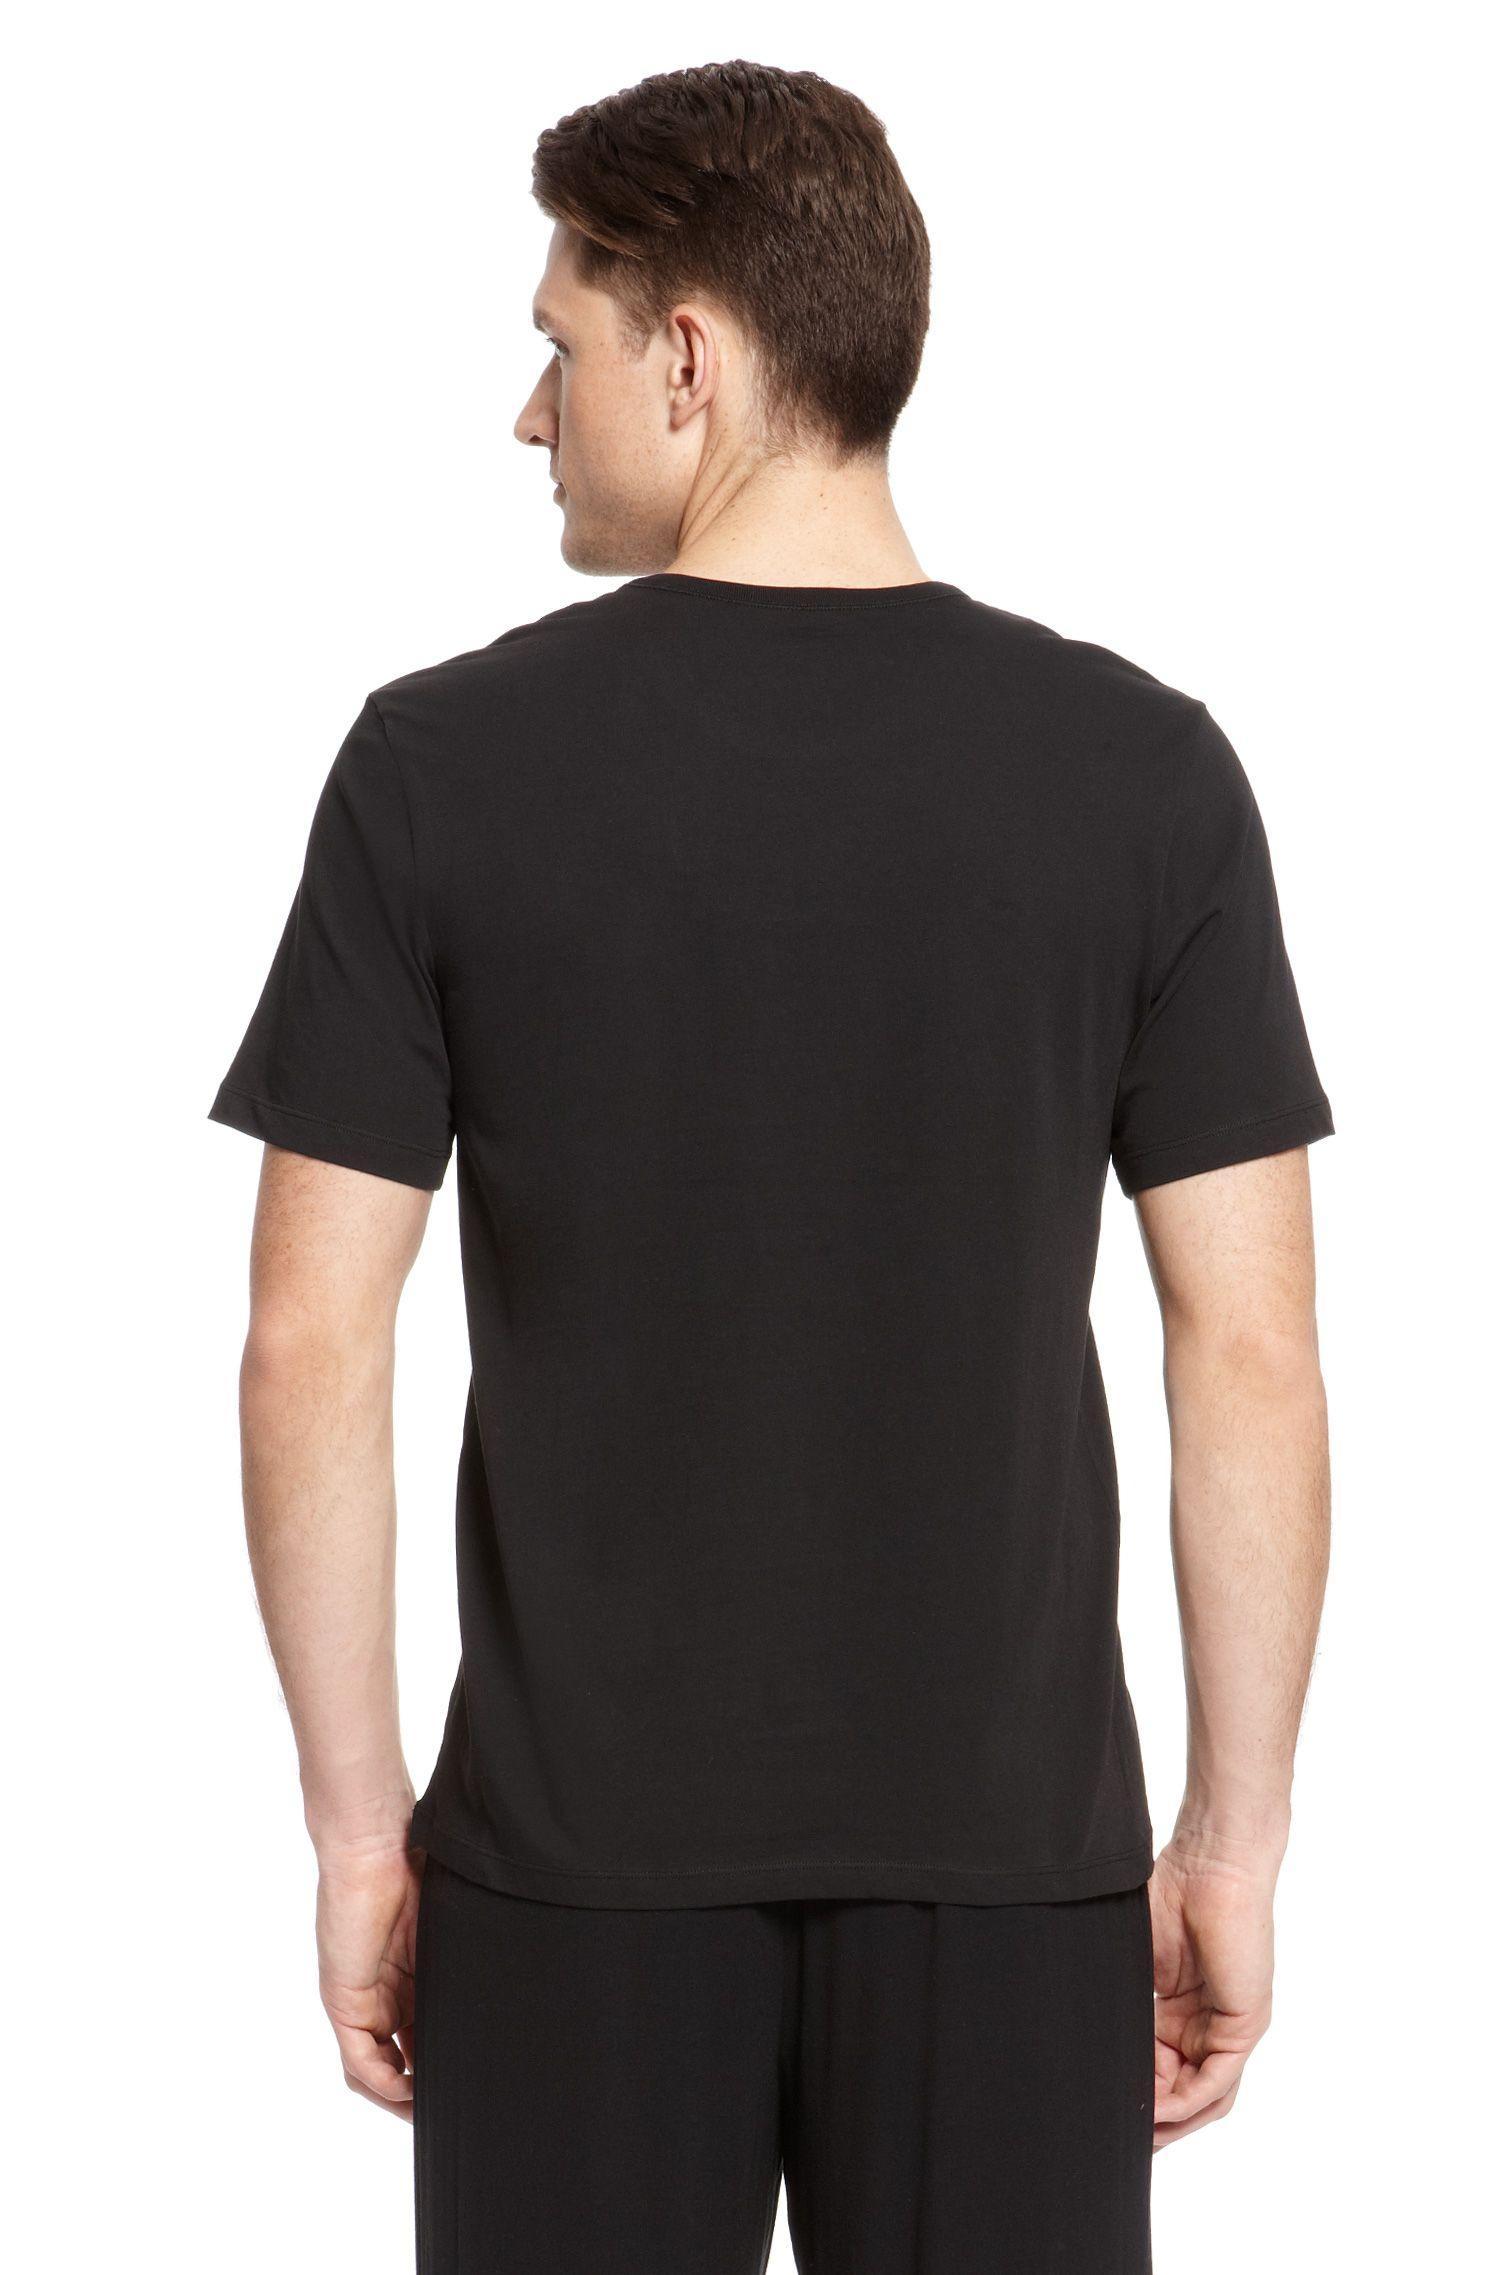 'Shirt' | Cotton Crewneck Undershirt, 3-Pack